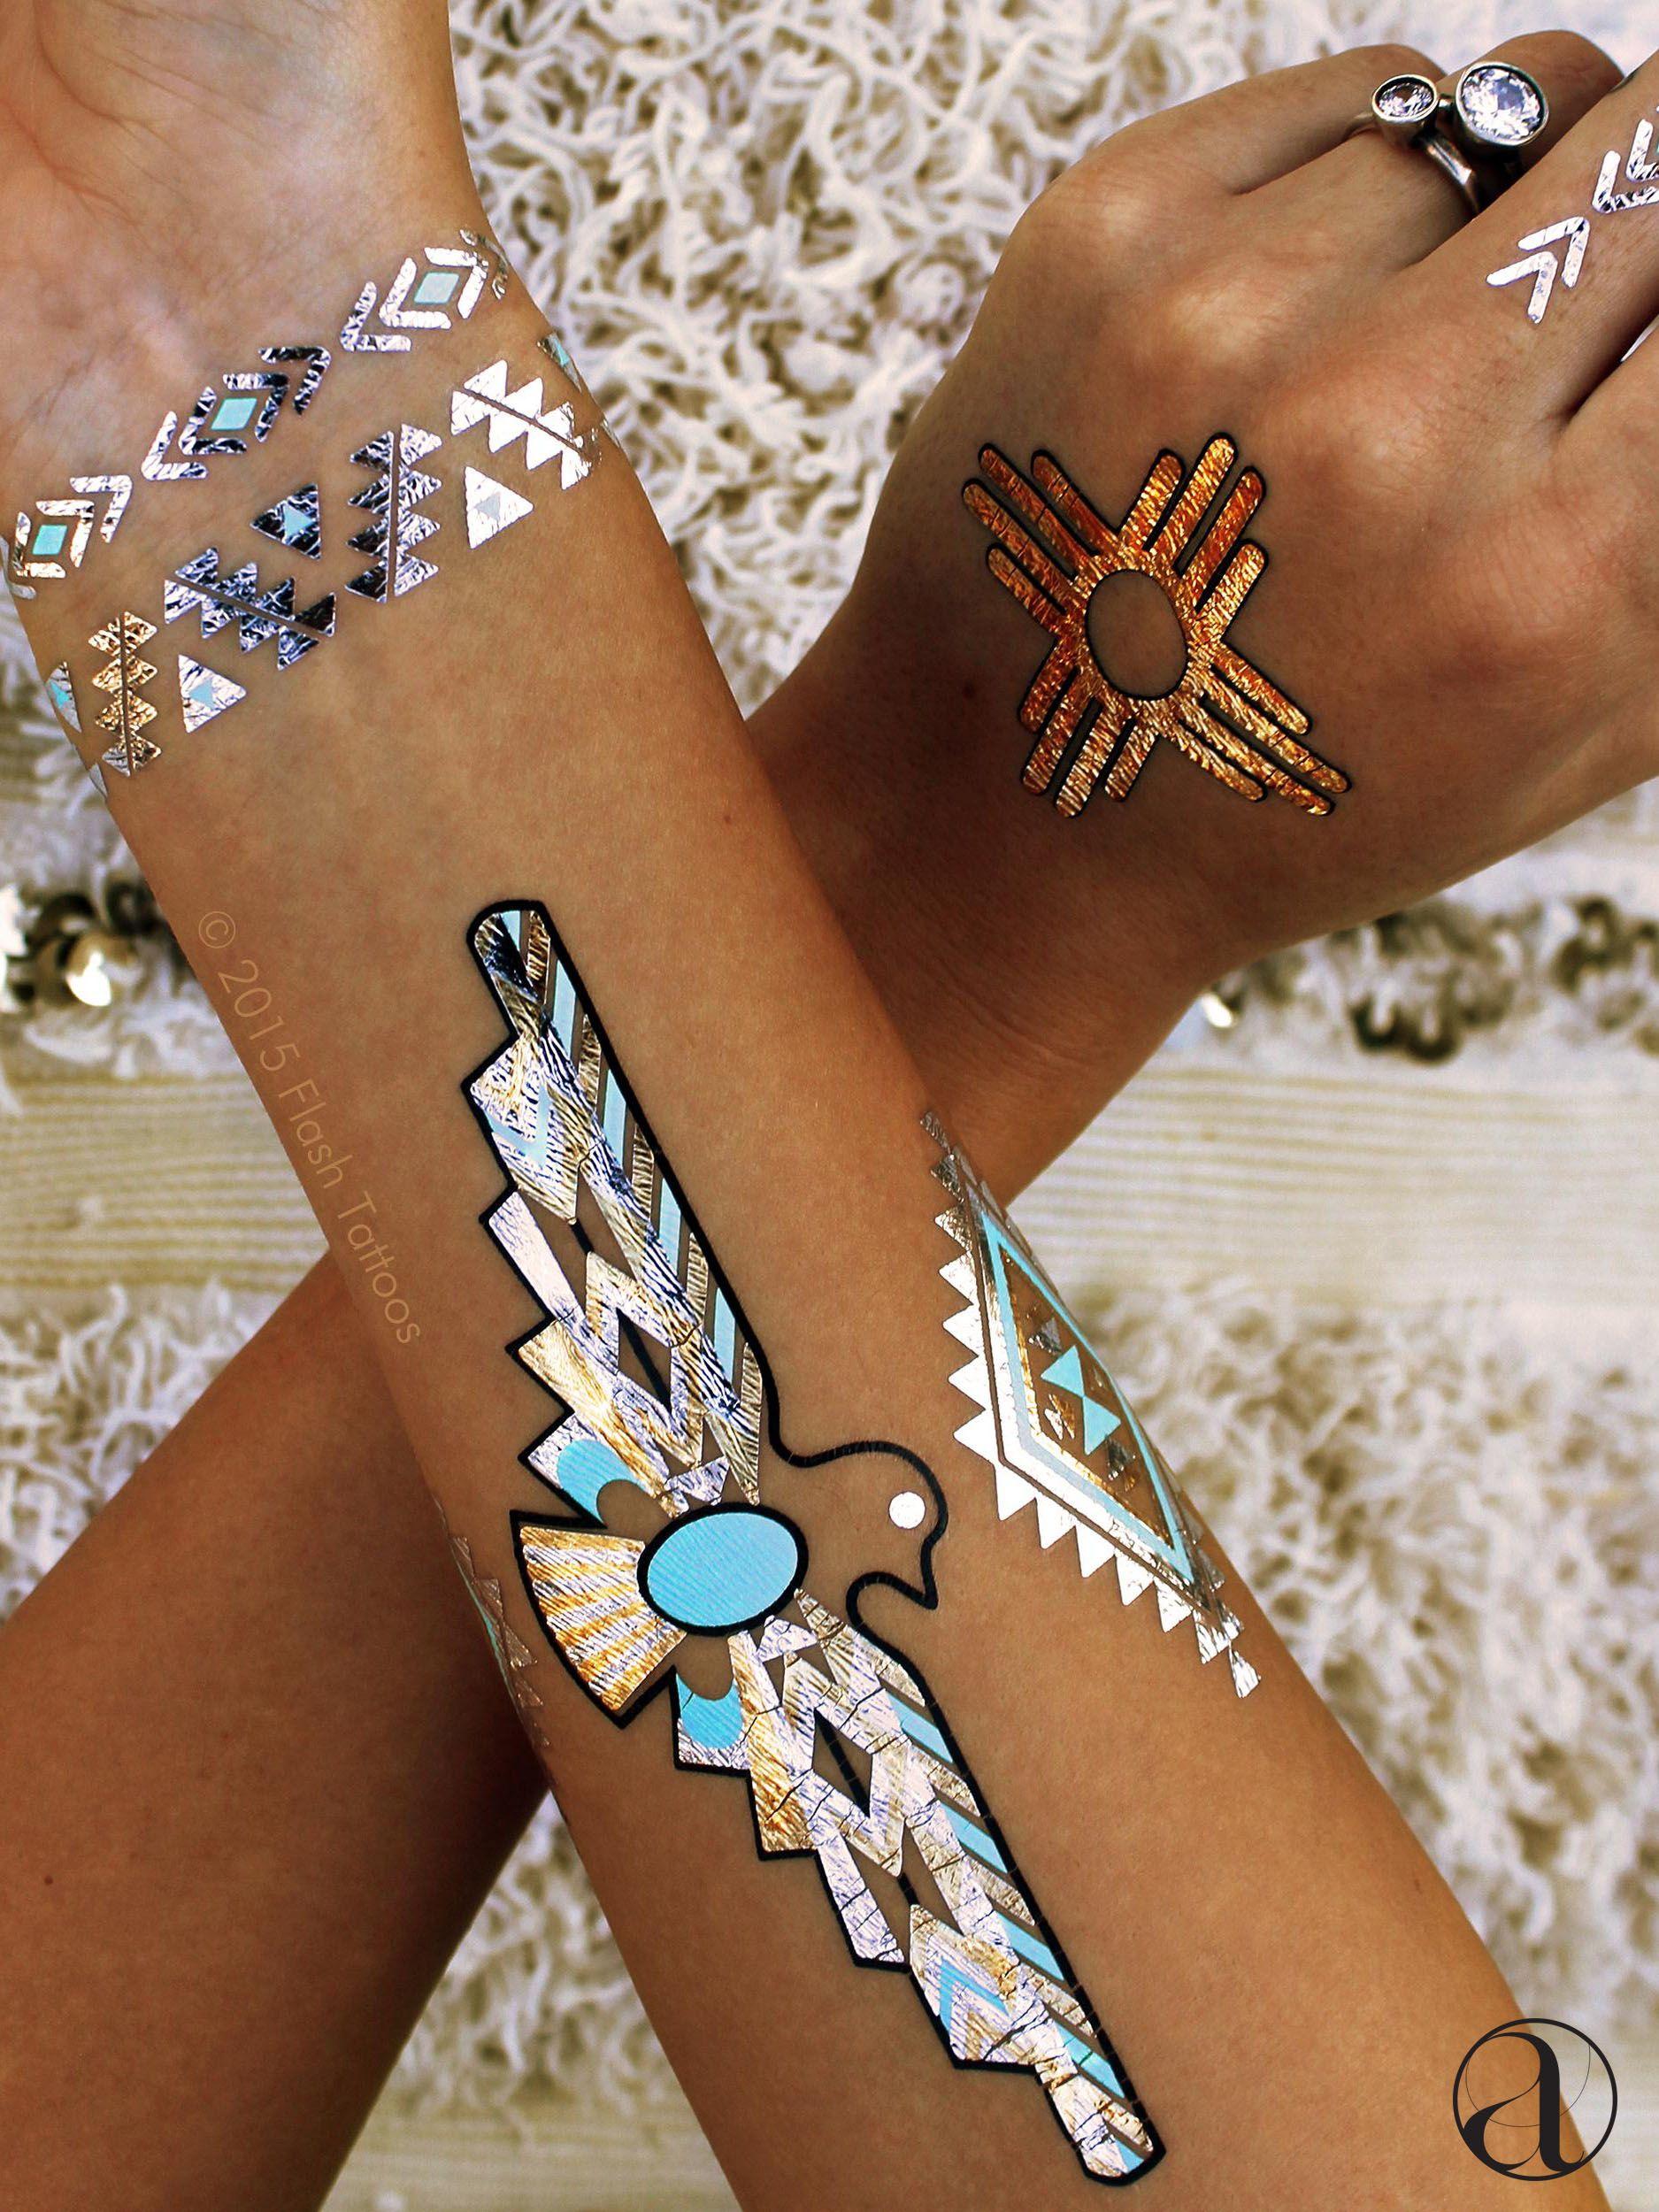 Desert dweller tattoos henna pinterest tattoos temporary